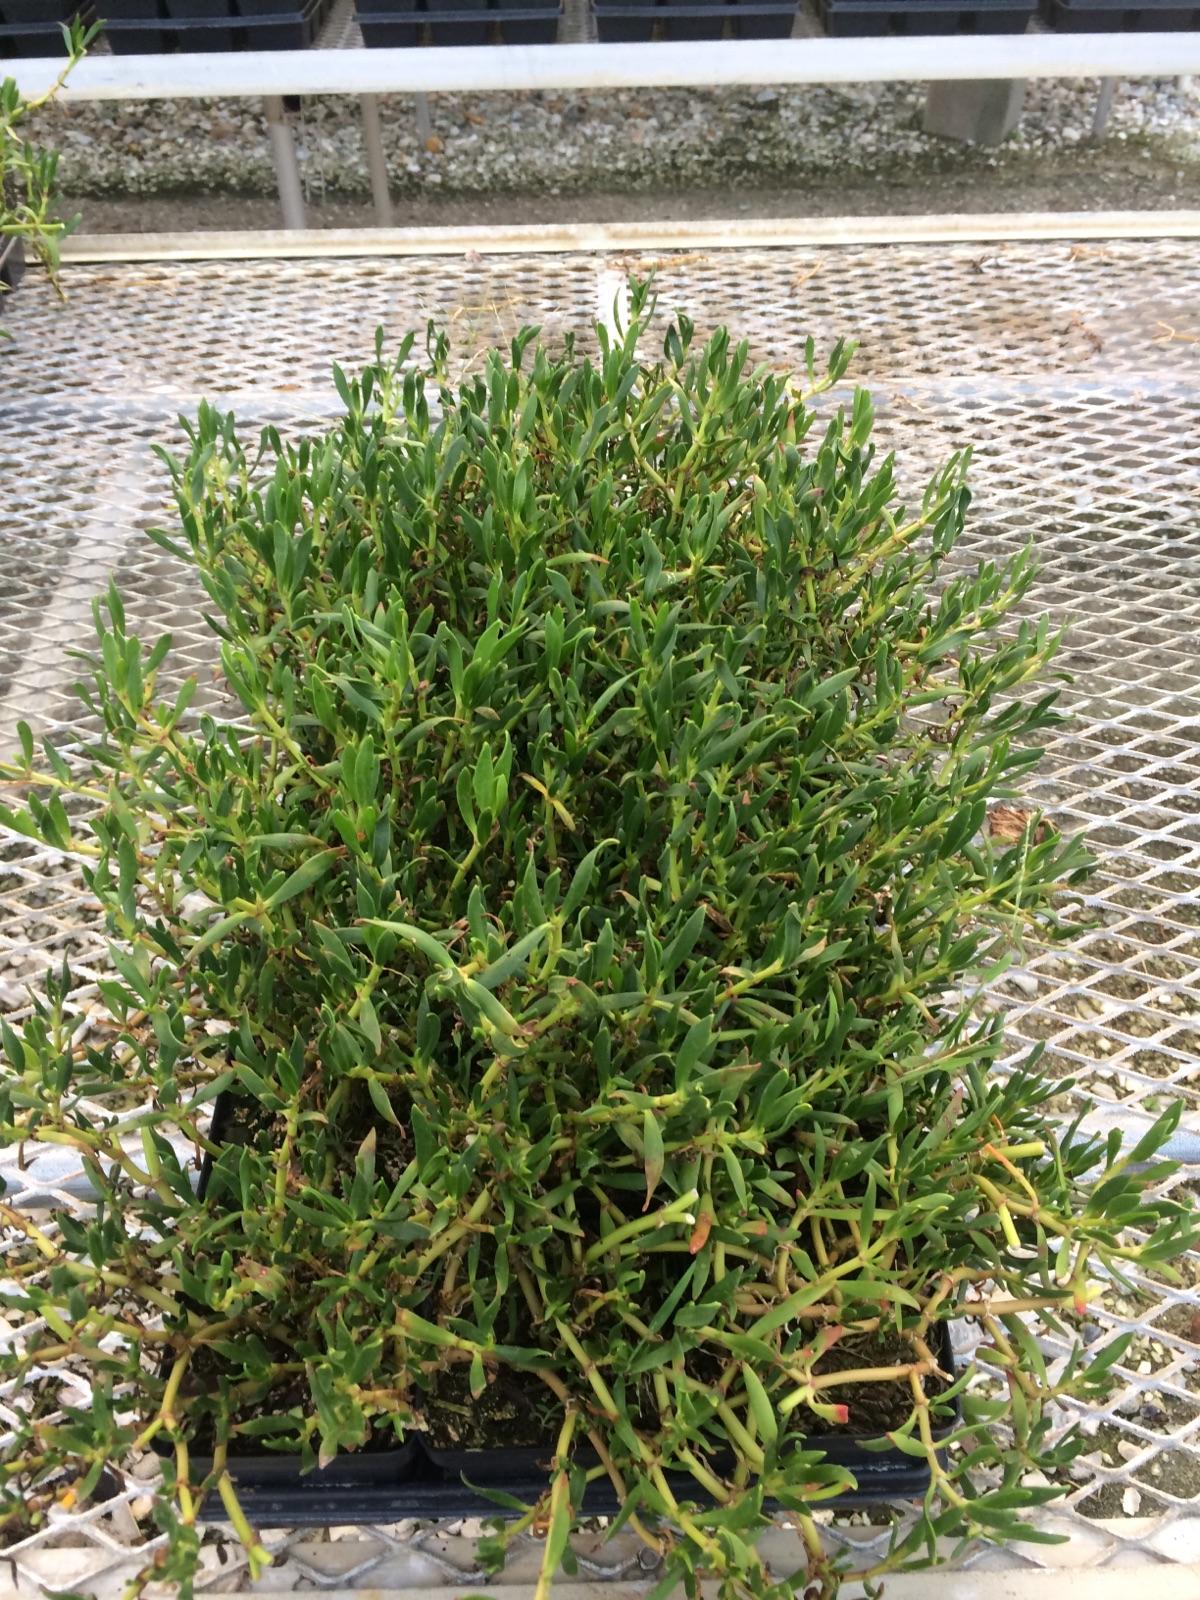 Growing Purslane How To Grow Edible Purslane In The Garden: Green Seasons Wholesale Nursery